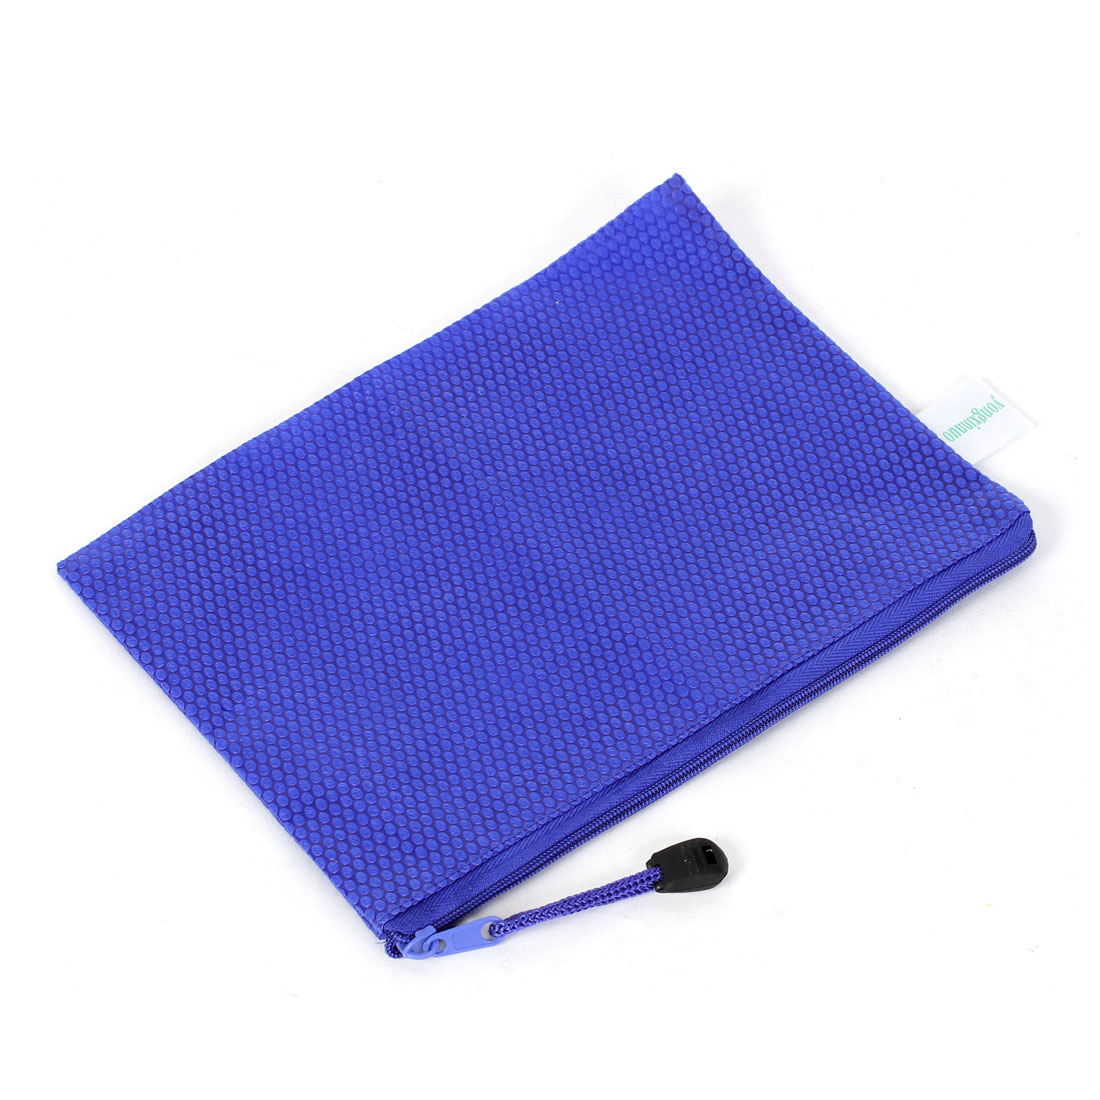 Blue Zipper Closure Paper Doucument File Pen Bag Folder Holder Organizer Pouch w Strap